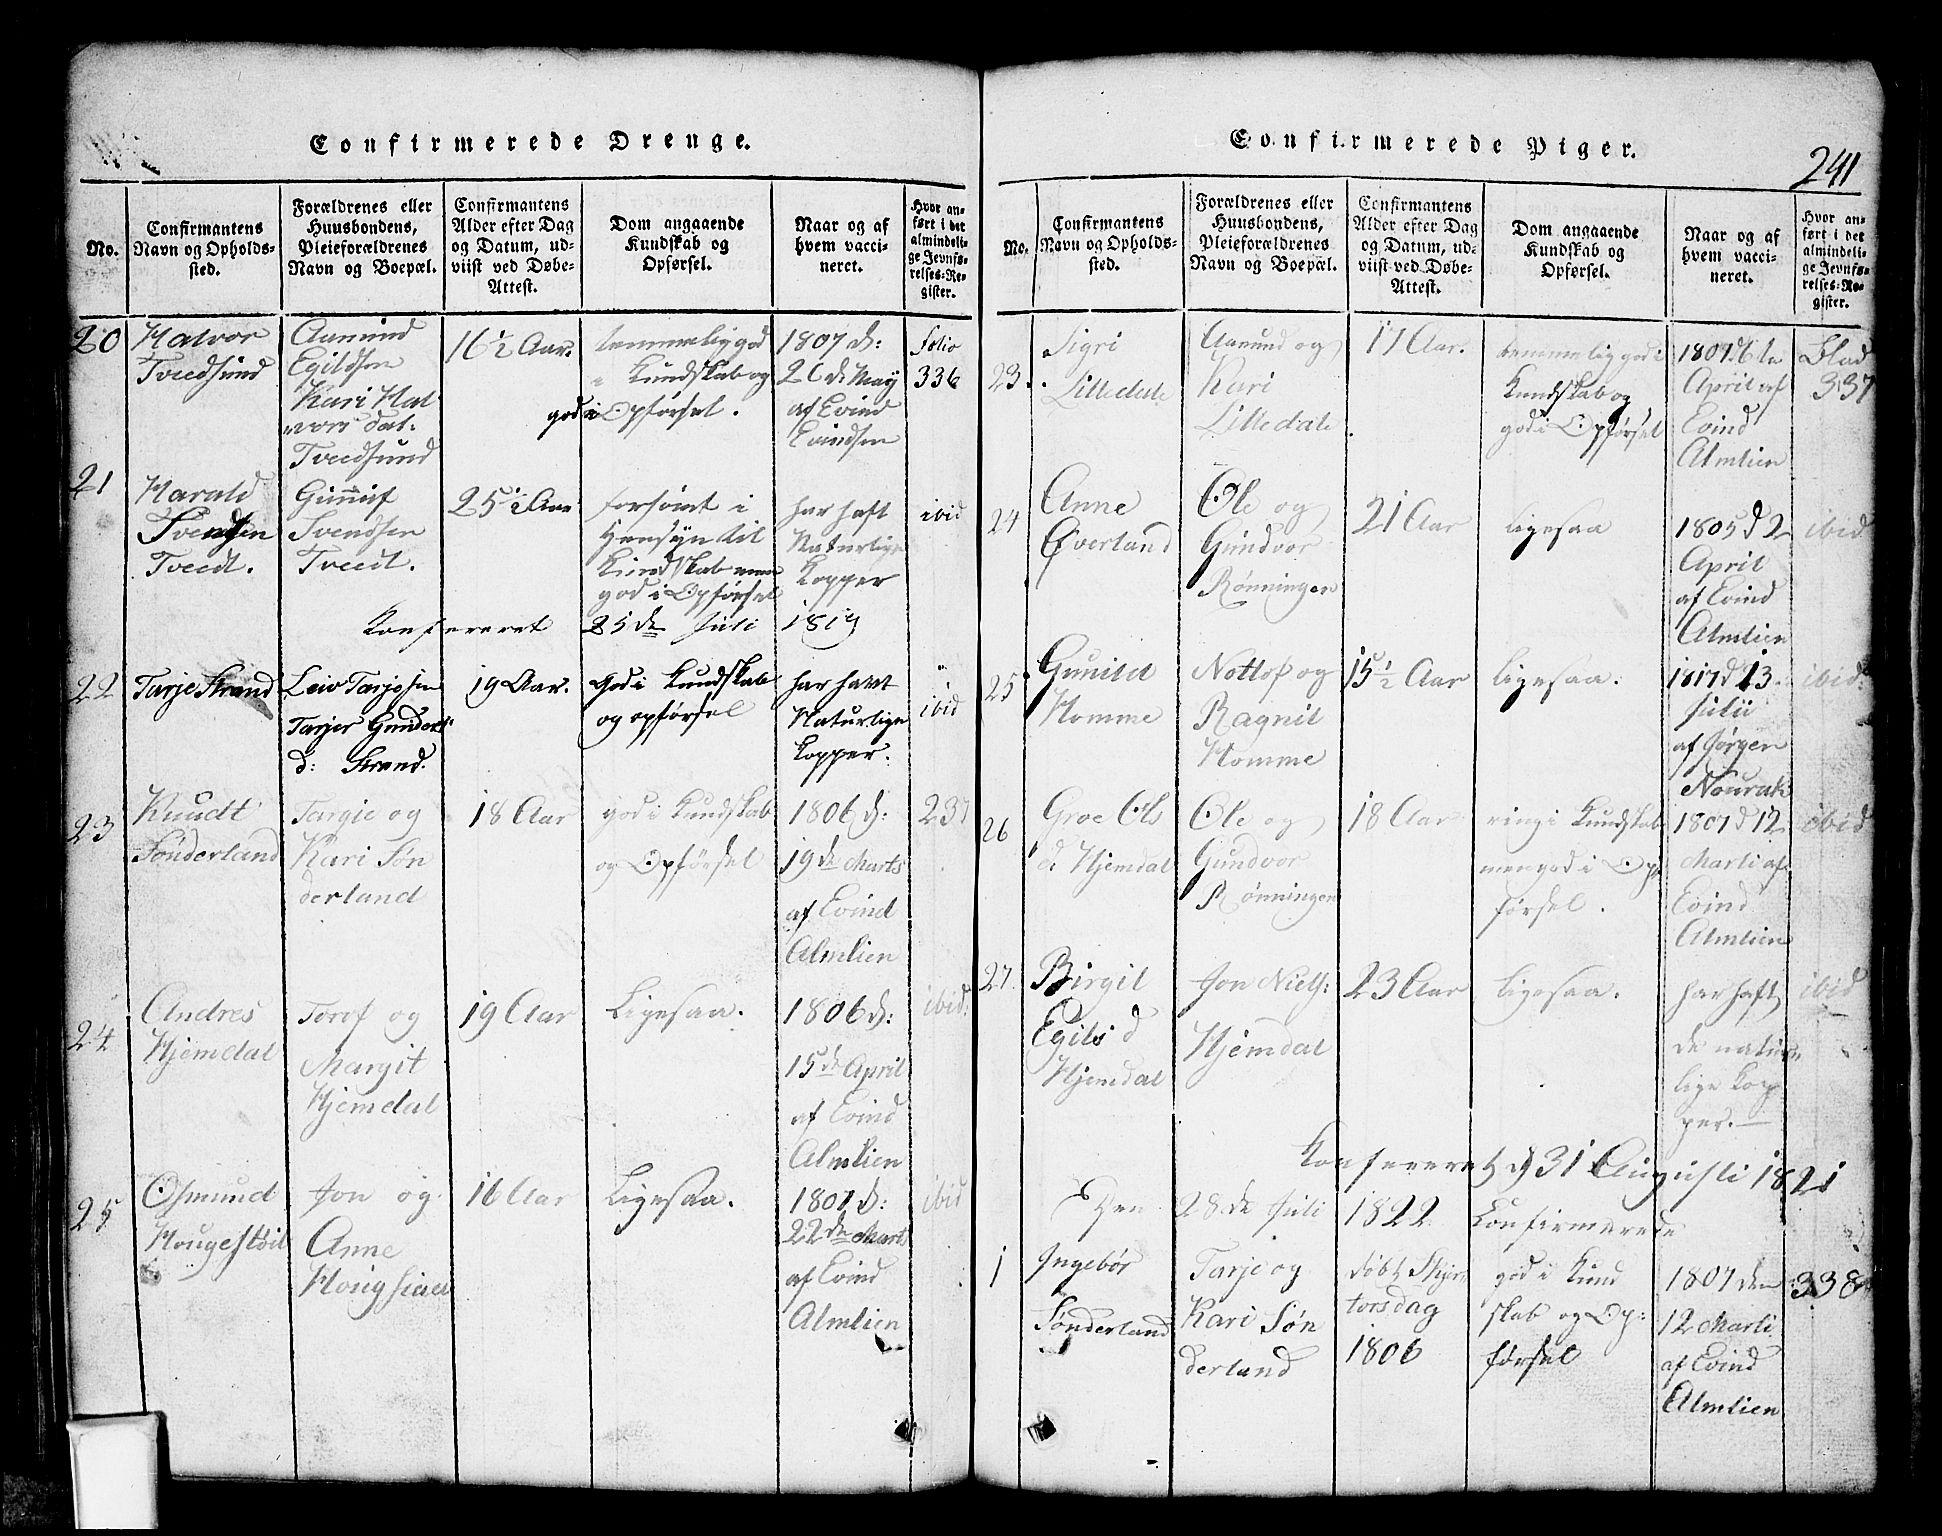 SAKO, Nissedal kirkebøker, G/Gb/L0001: Klokkerbok nr. II 1, 1814-1862, s. 241